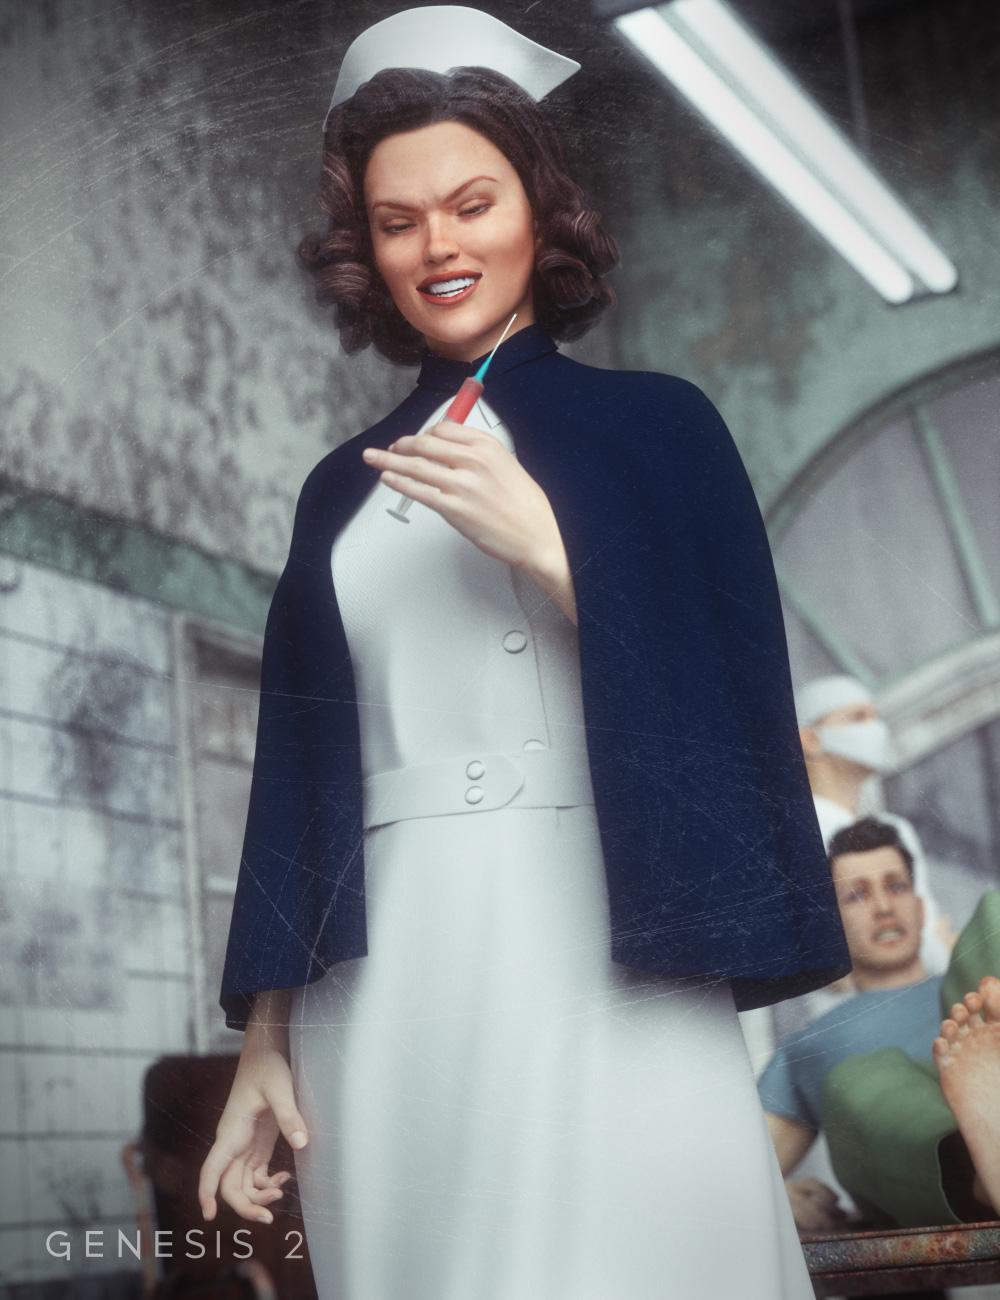 Mad Nurse for Genesis 2 Female(s) by: Ravenhair, 3D Models by Daz 3D